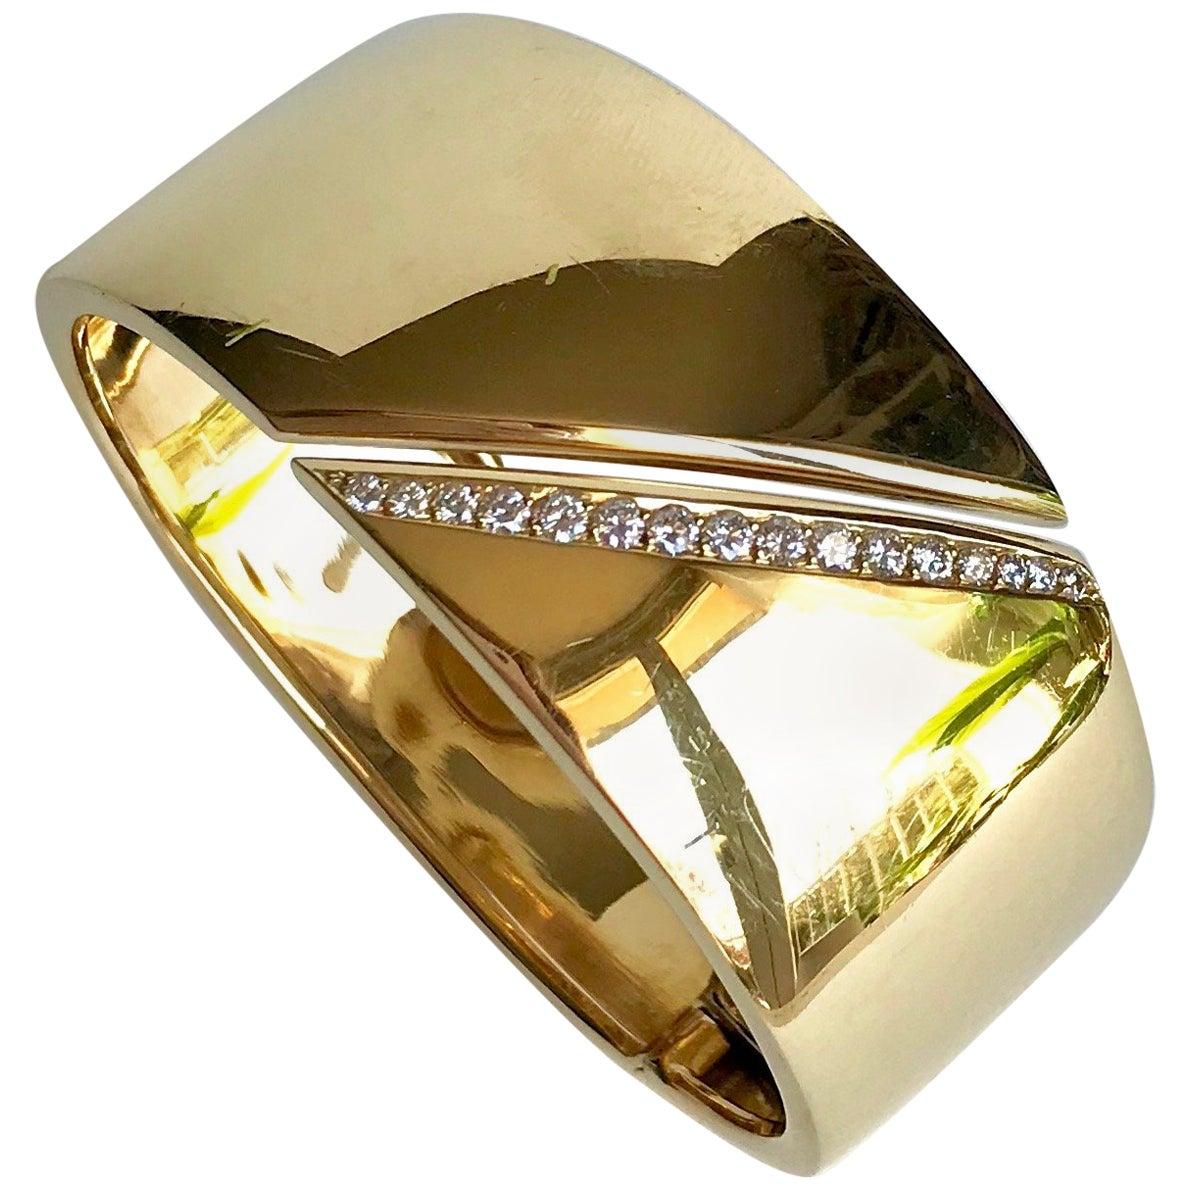 Hermes Rigid Bracelet in 18 Carat Yellow Gold and Line of Diamonds